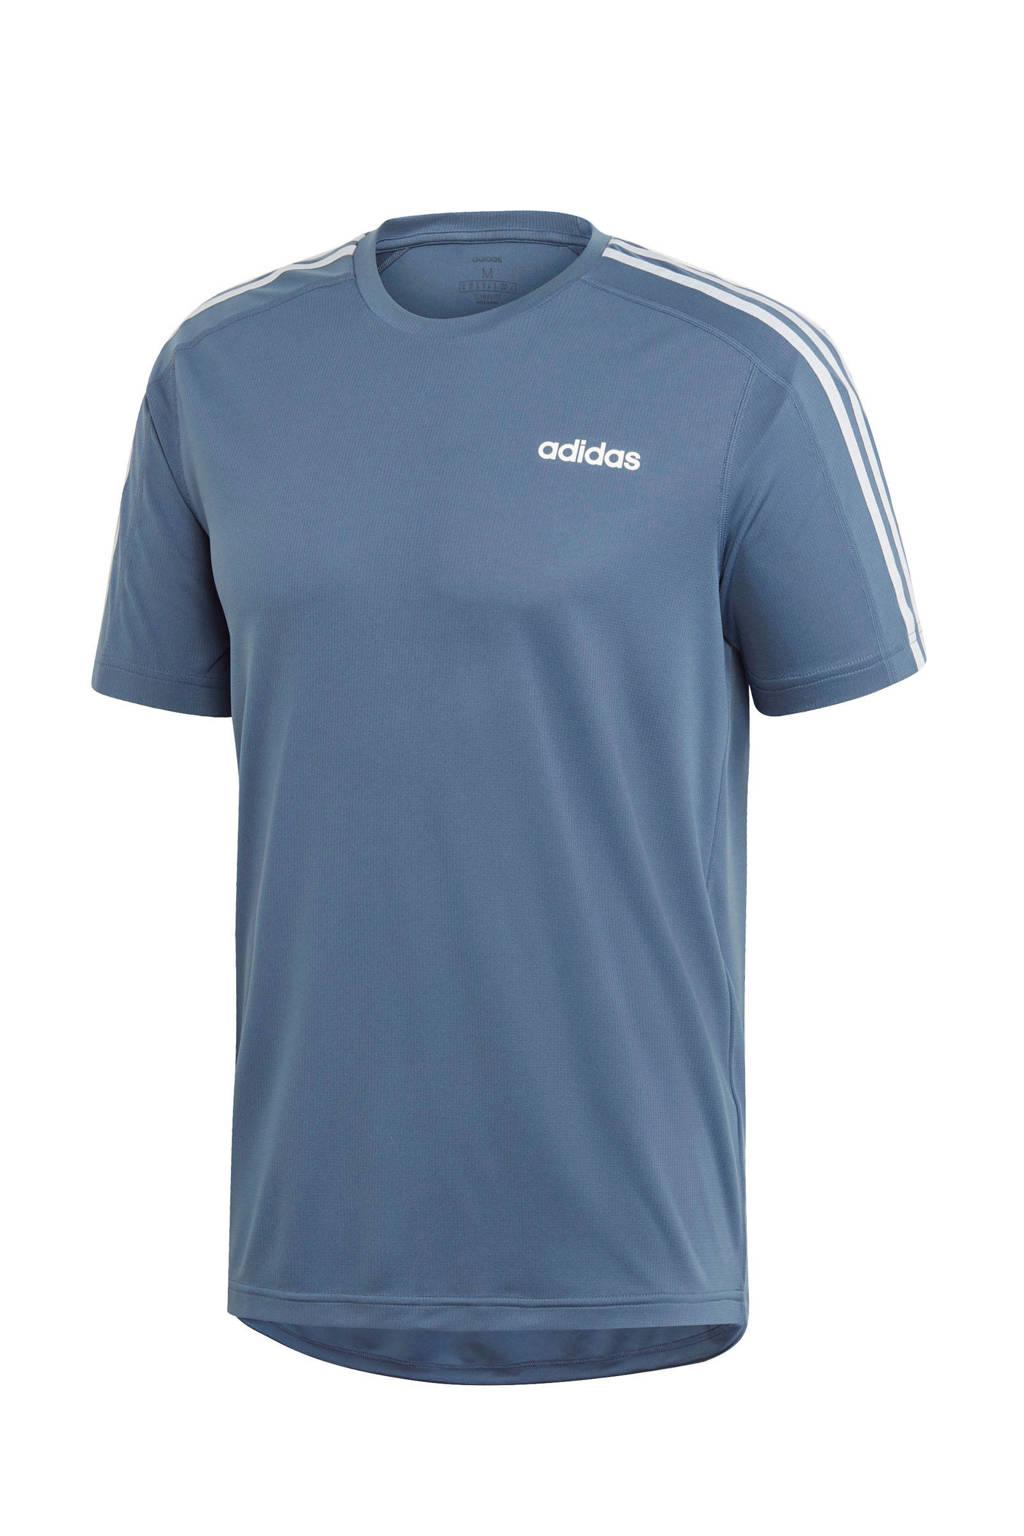 adidas performance   sport T-shirt grijsblauw, Grijsblauw/wit